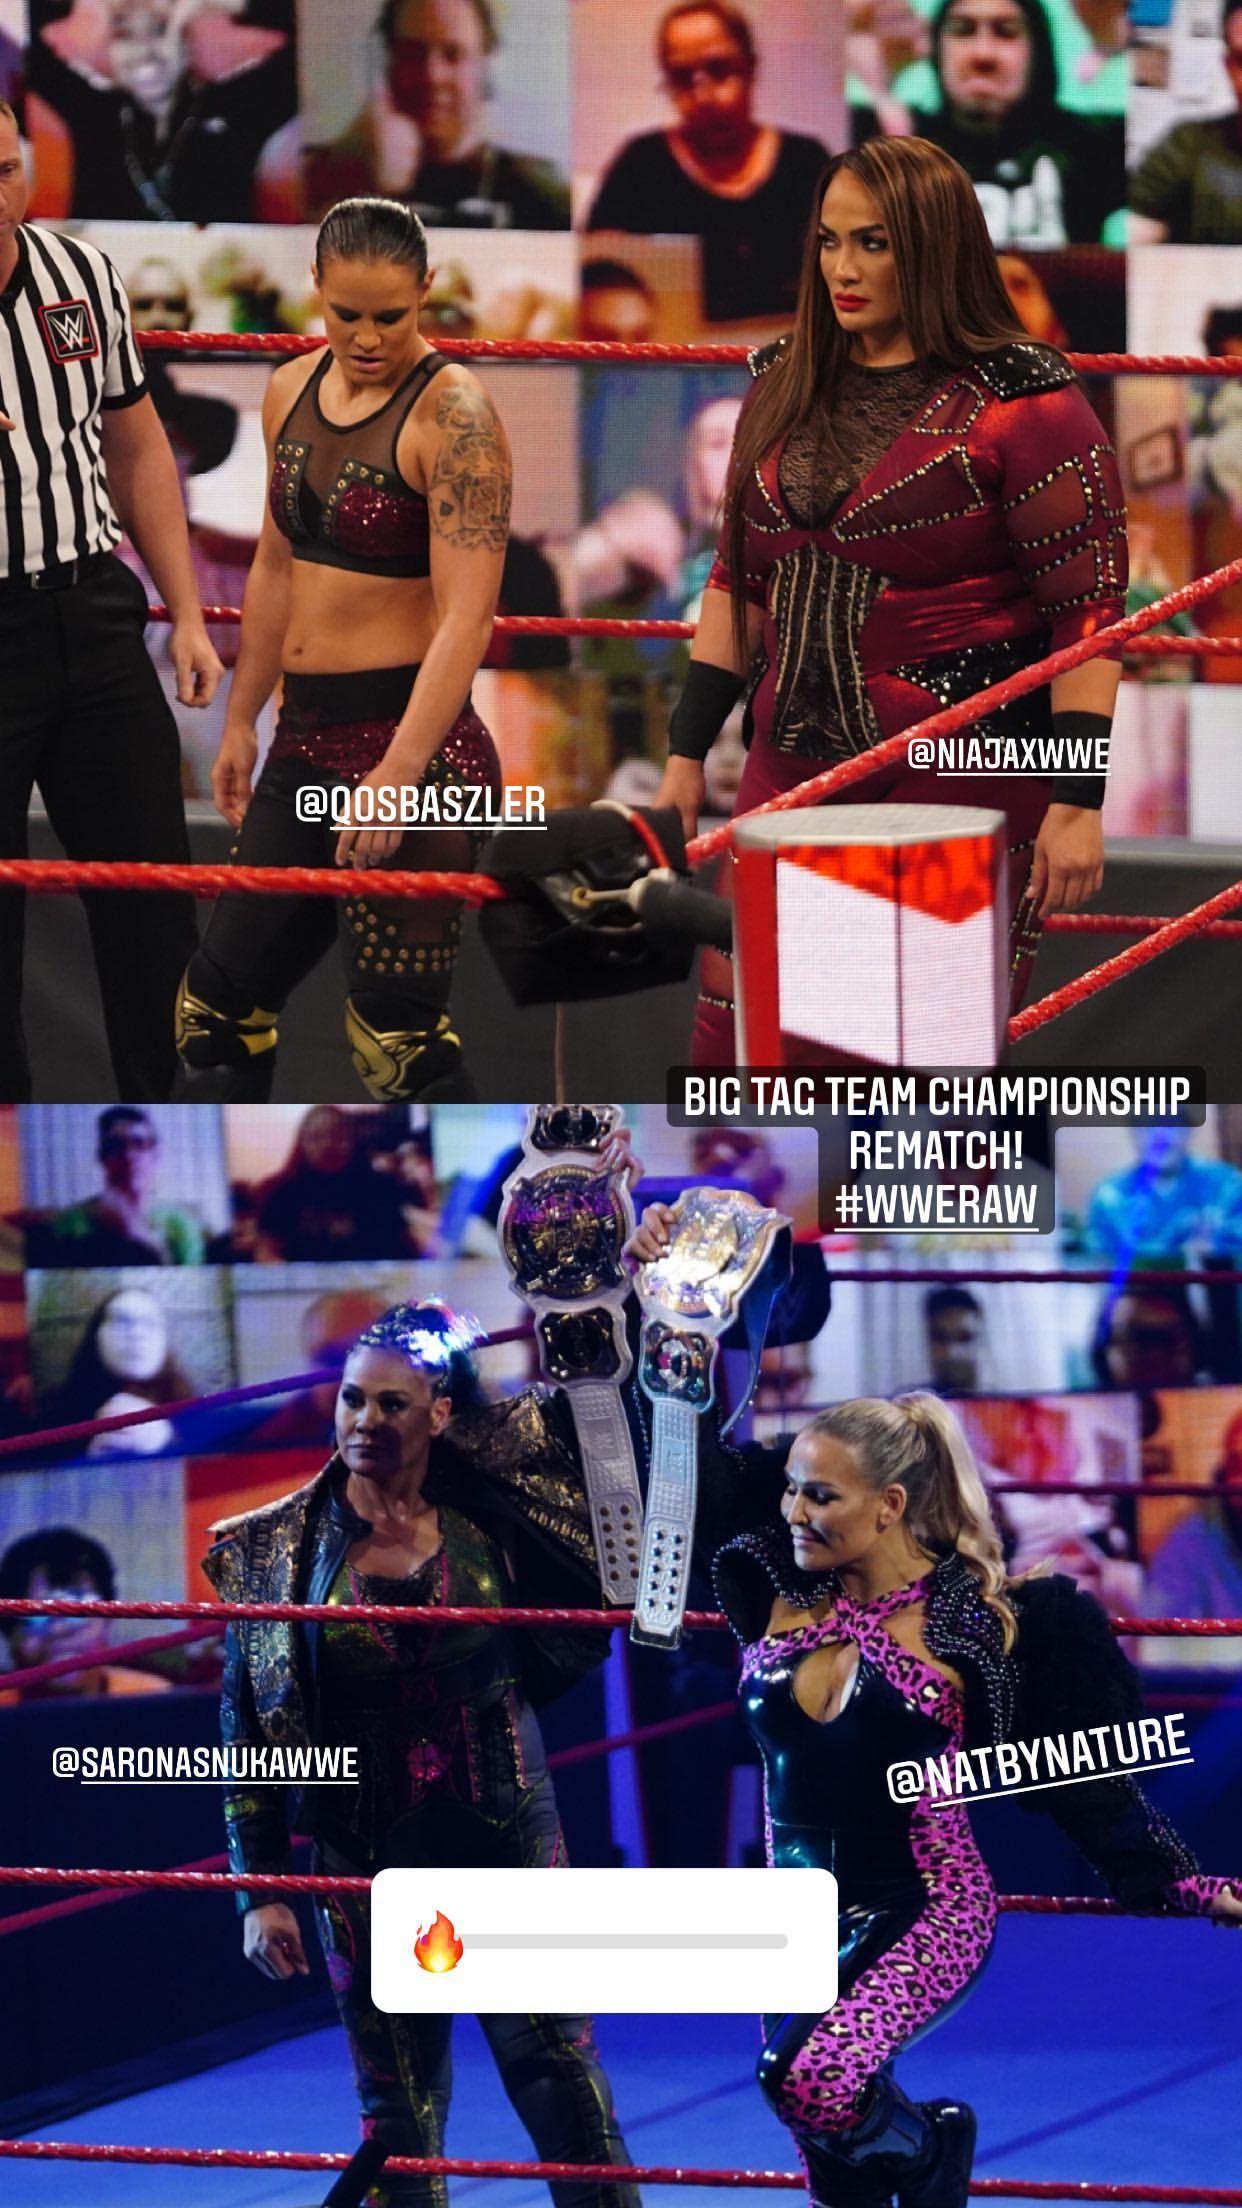 WWE women ⭐, ay Shayna Baszler, Nia Jax, Tamina, Natalya ⭐